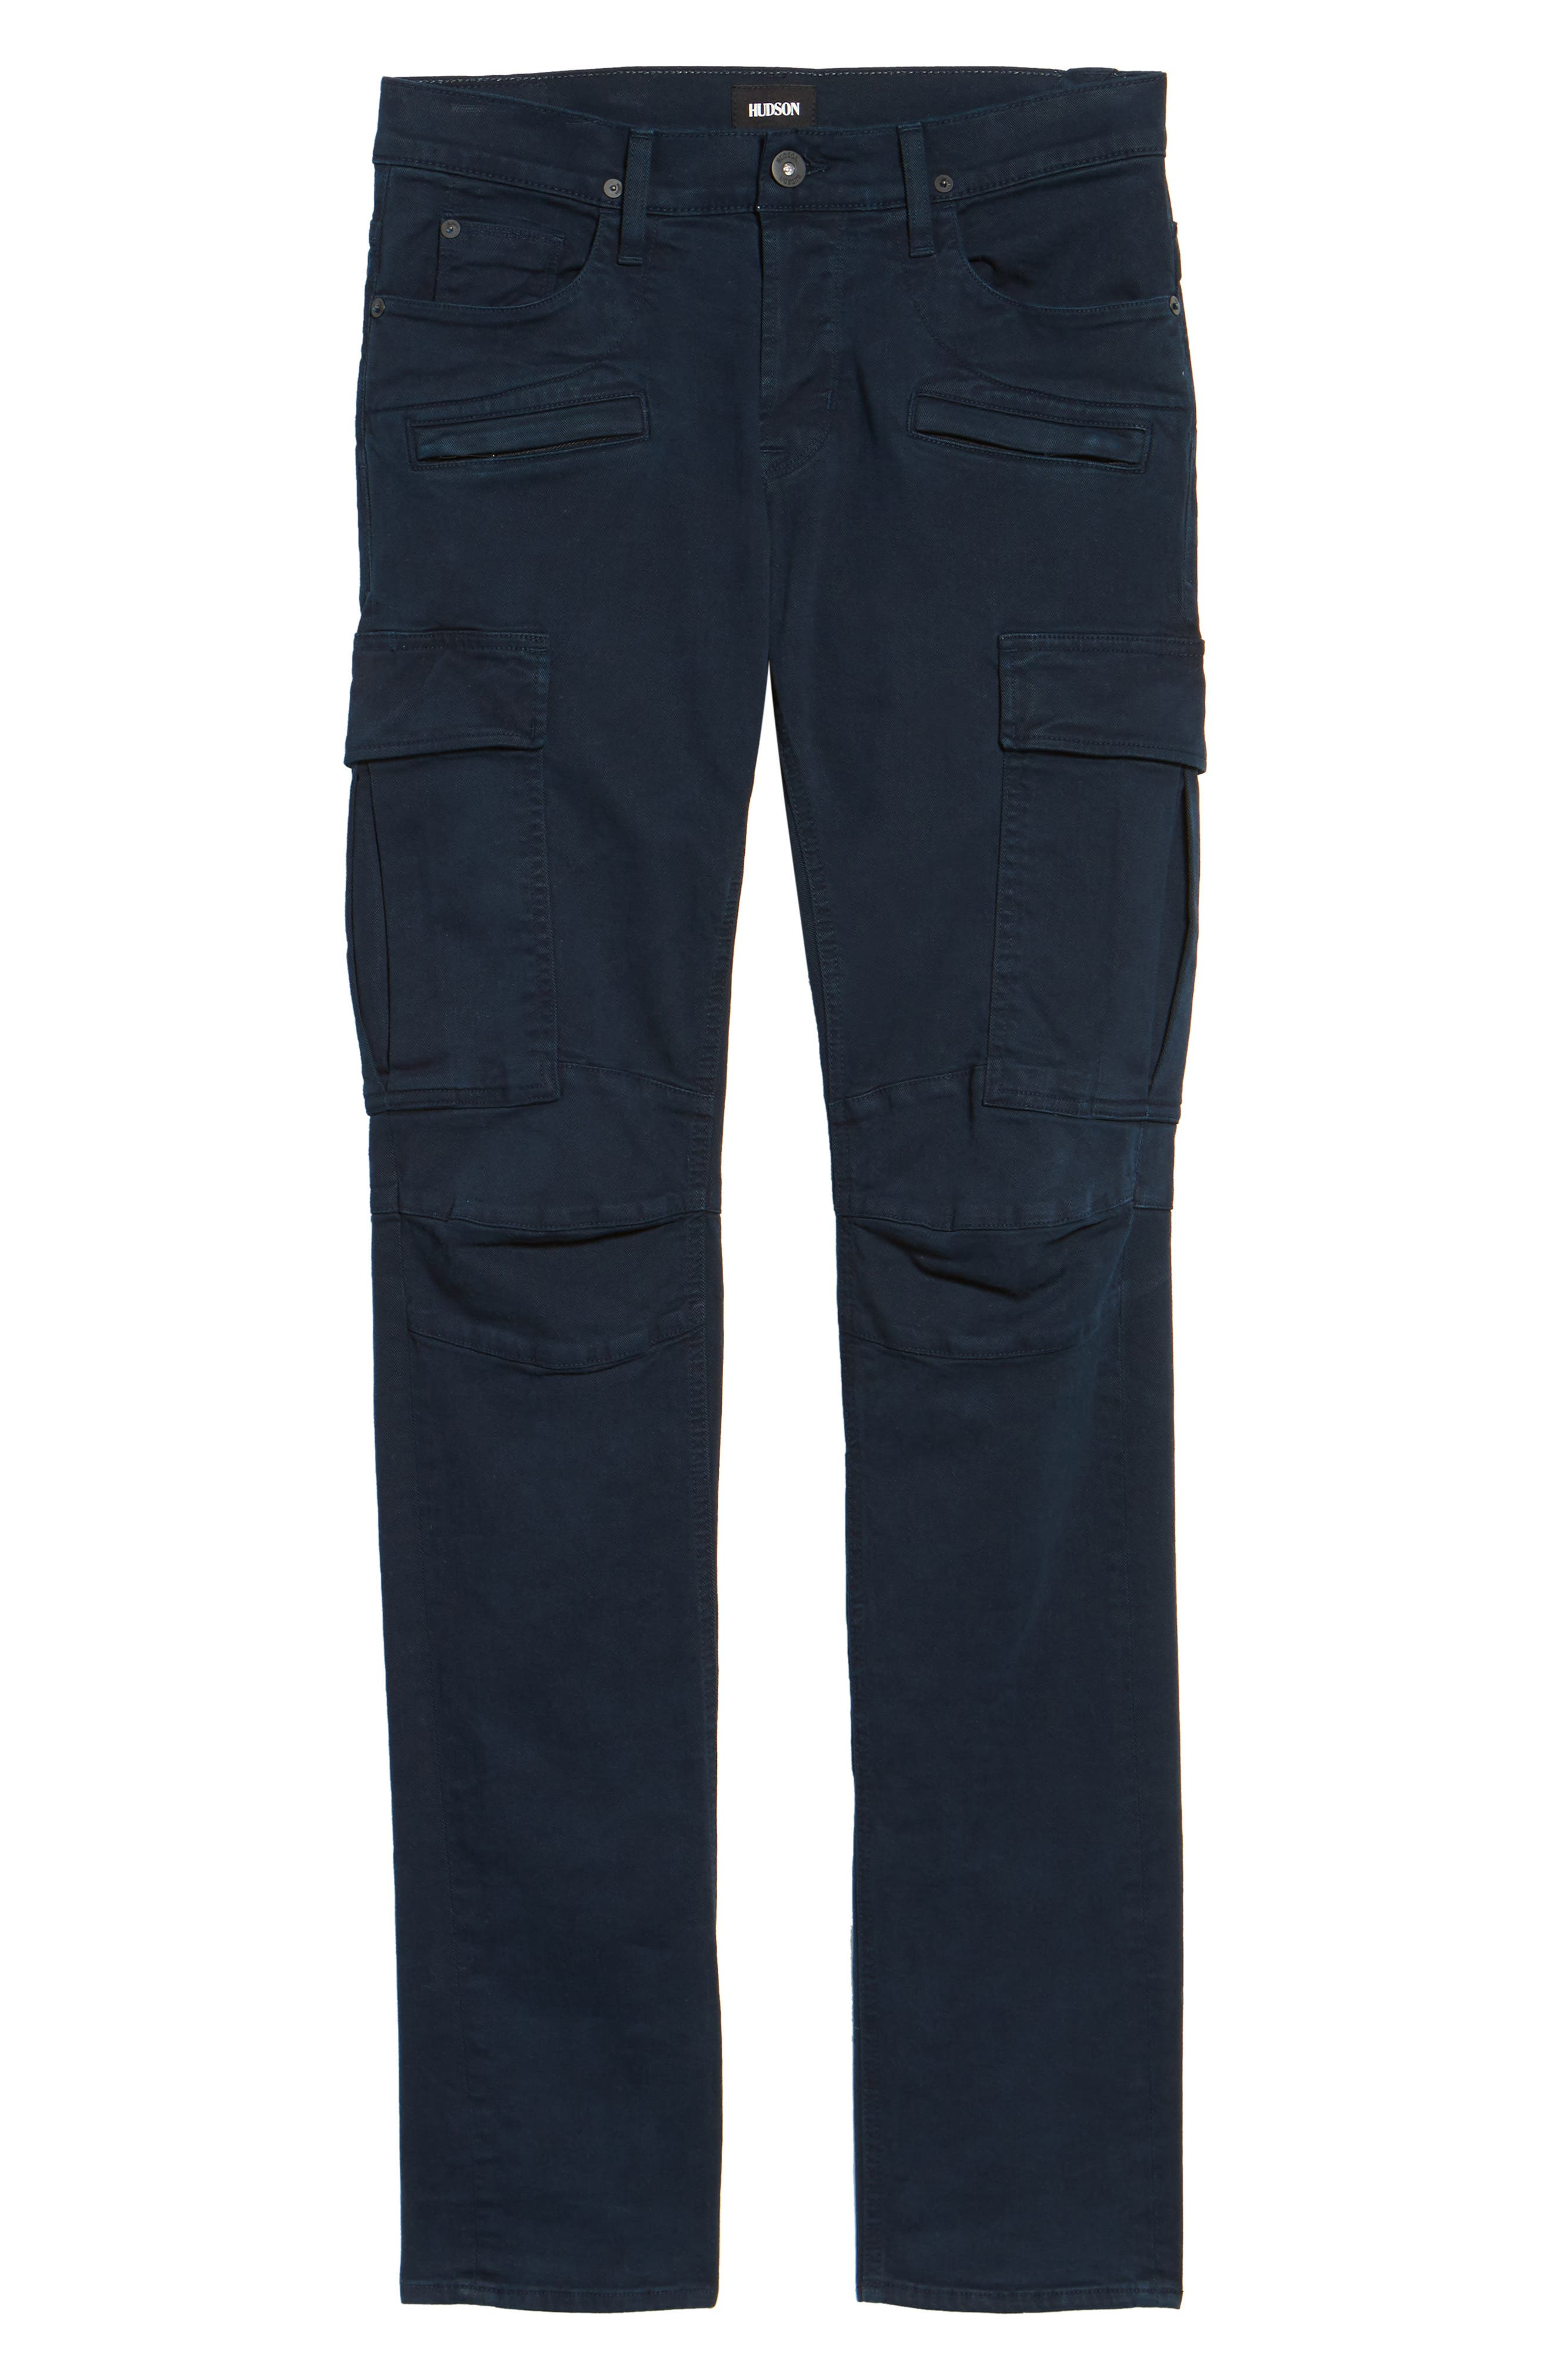 Greyson Cargo Biker Skinny Fit Jeans,                             Alternate thumbnail 6, color,                             Ink